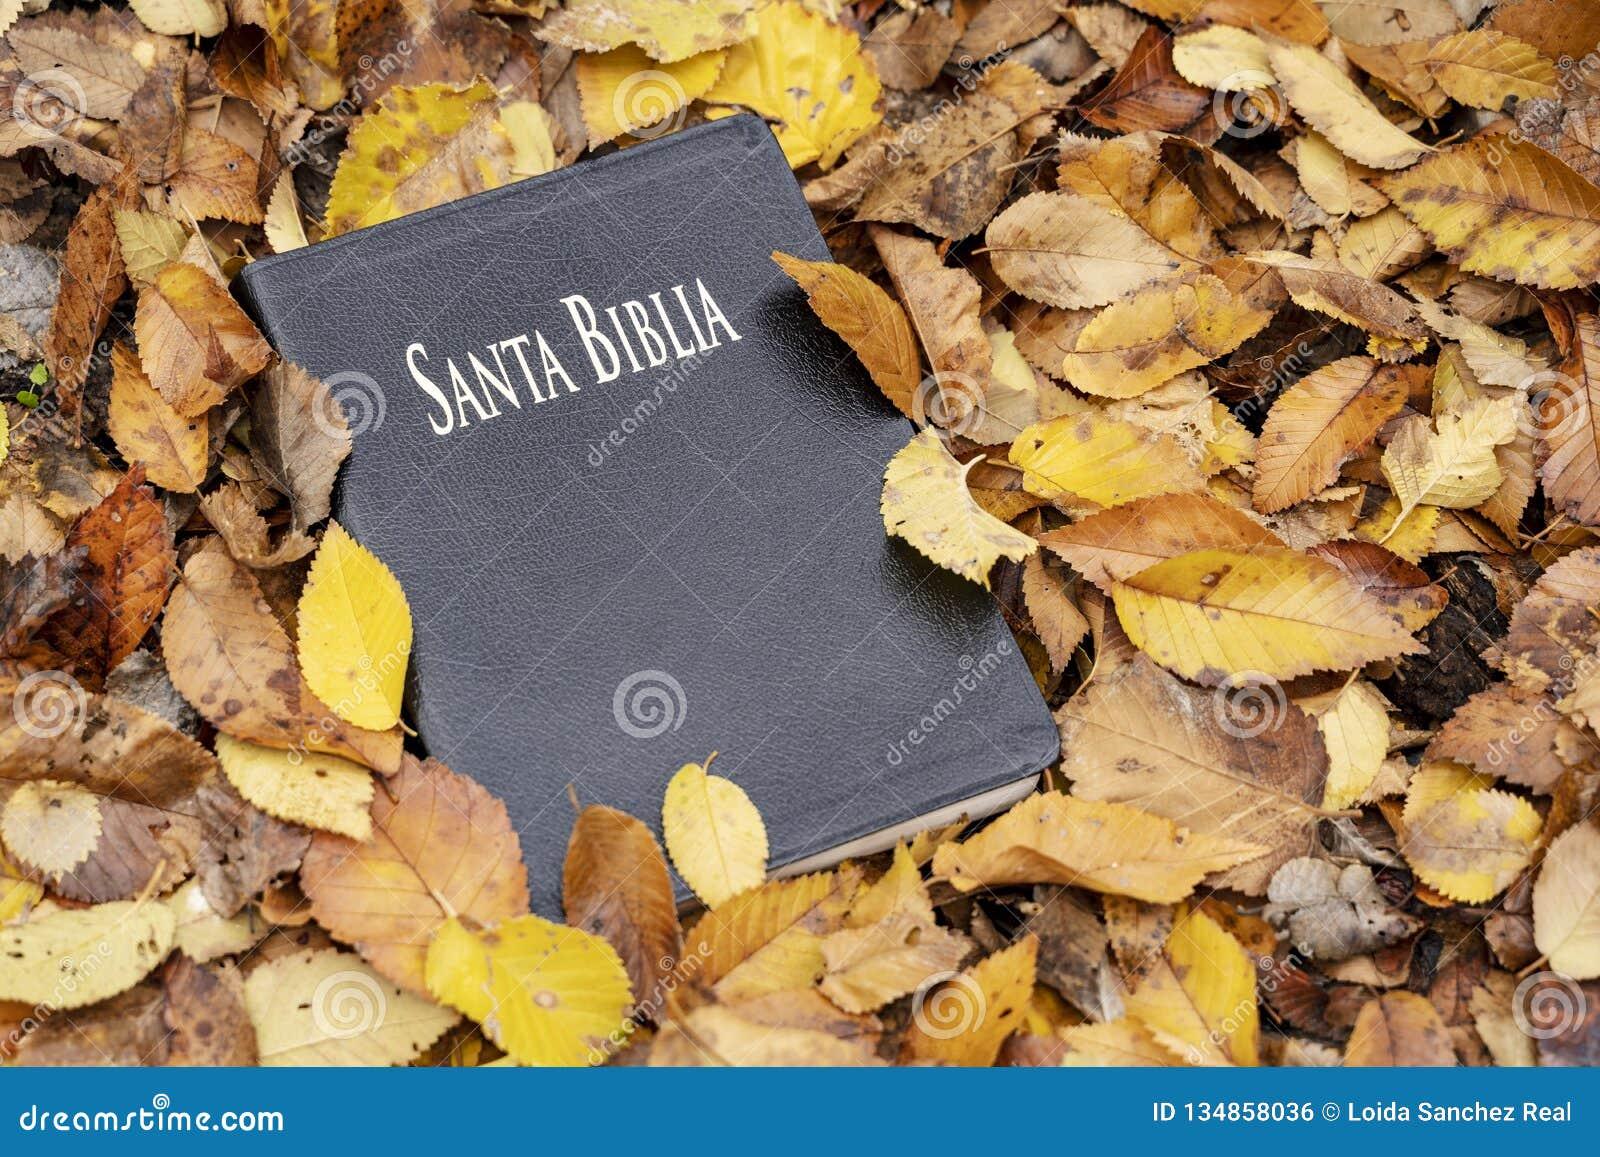 Sagrada Biblia E